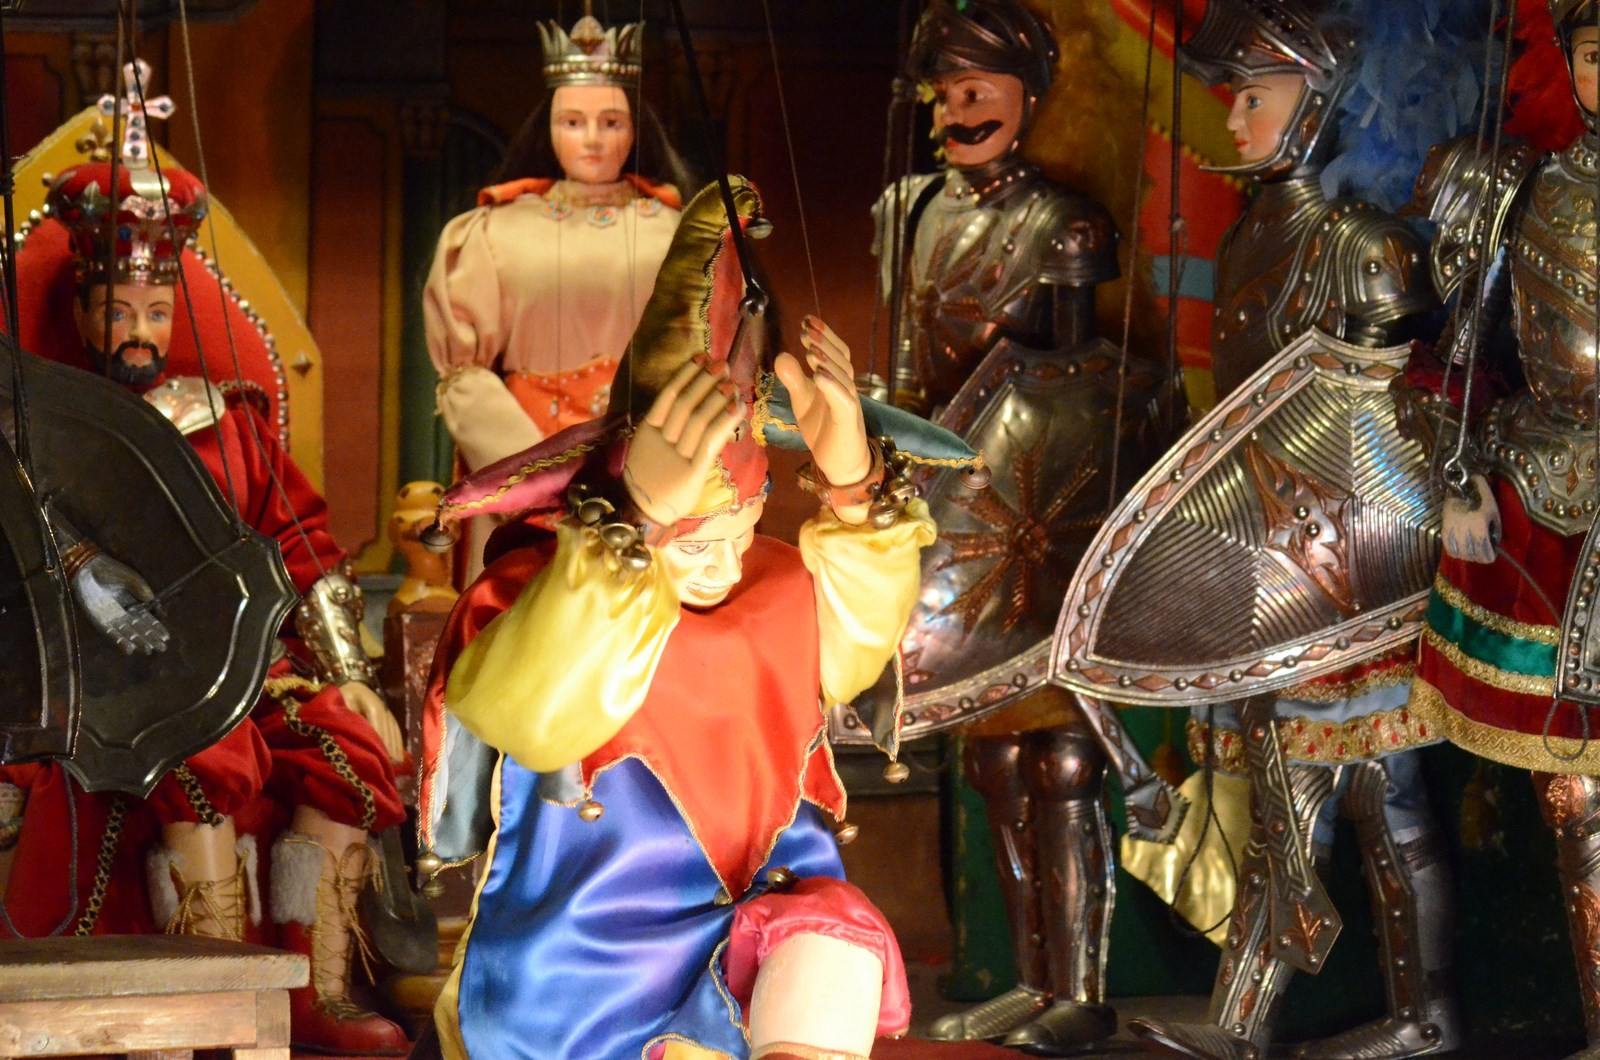 Palermo, Sizilianisches Marionettentheater